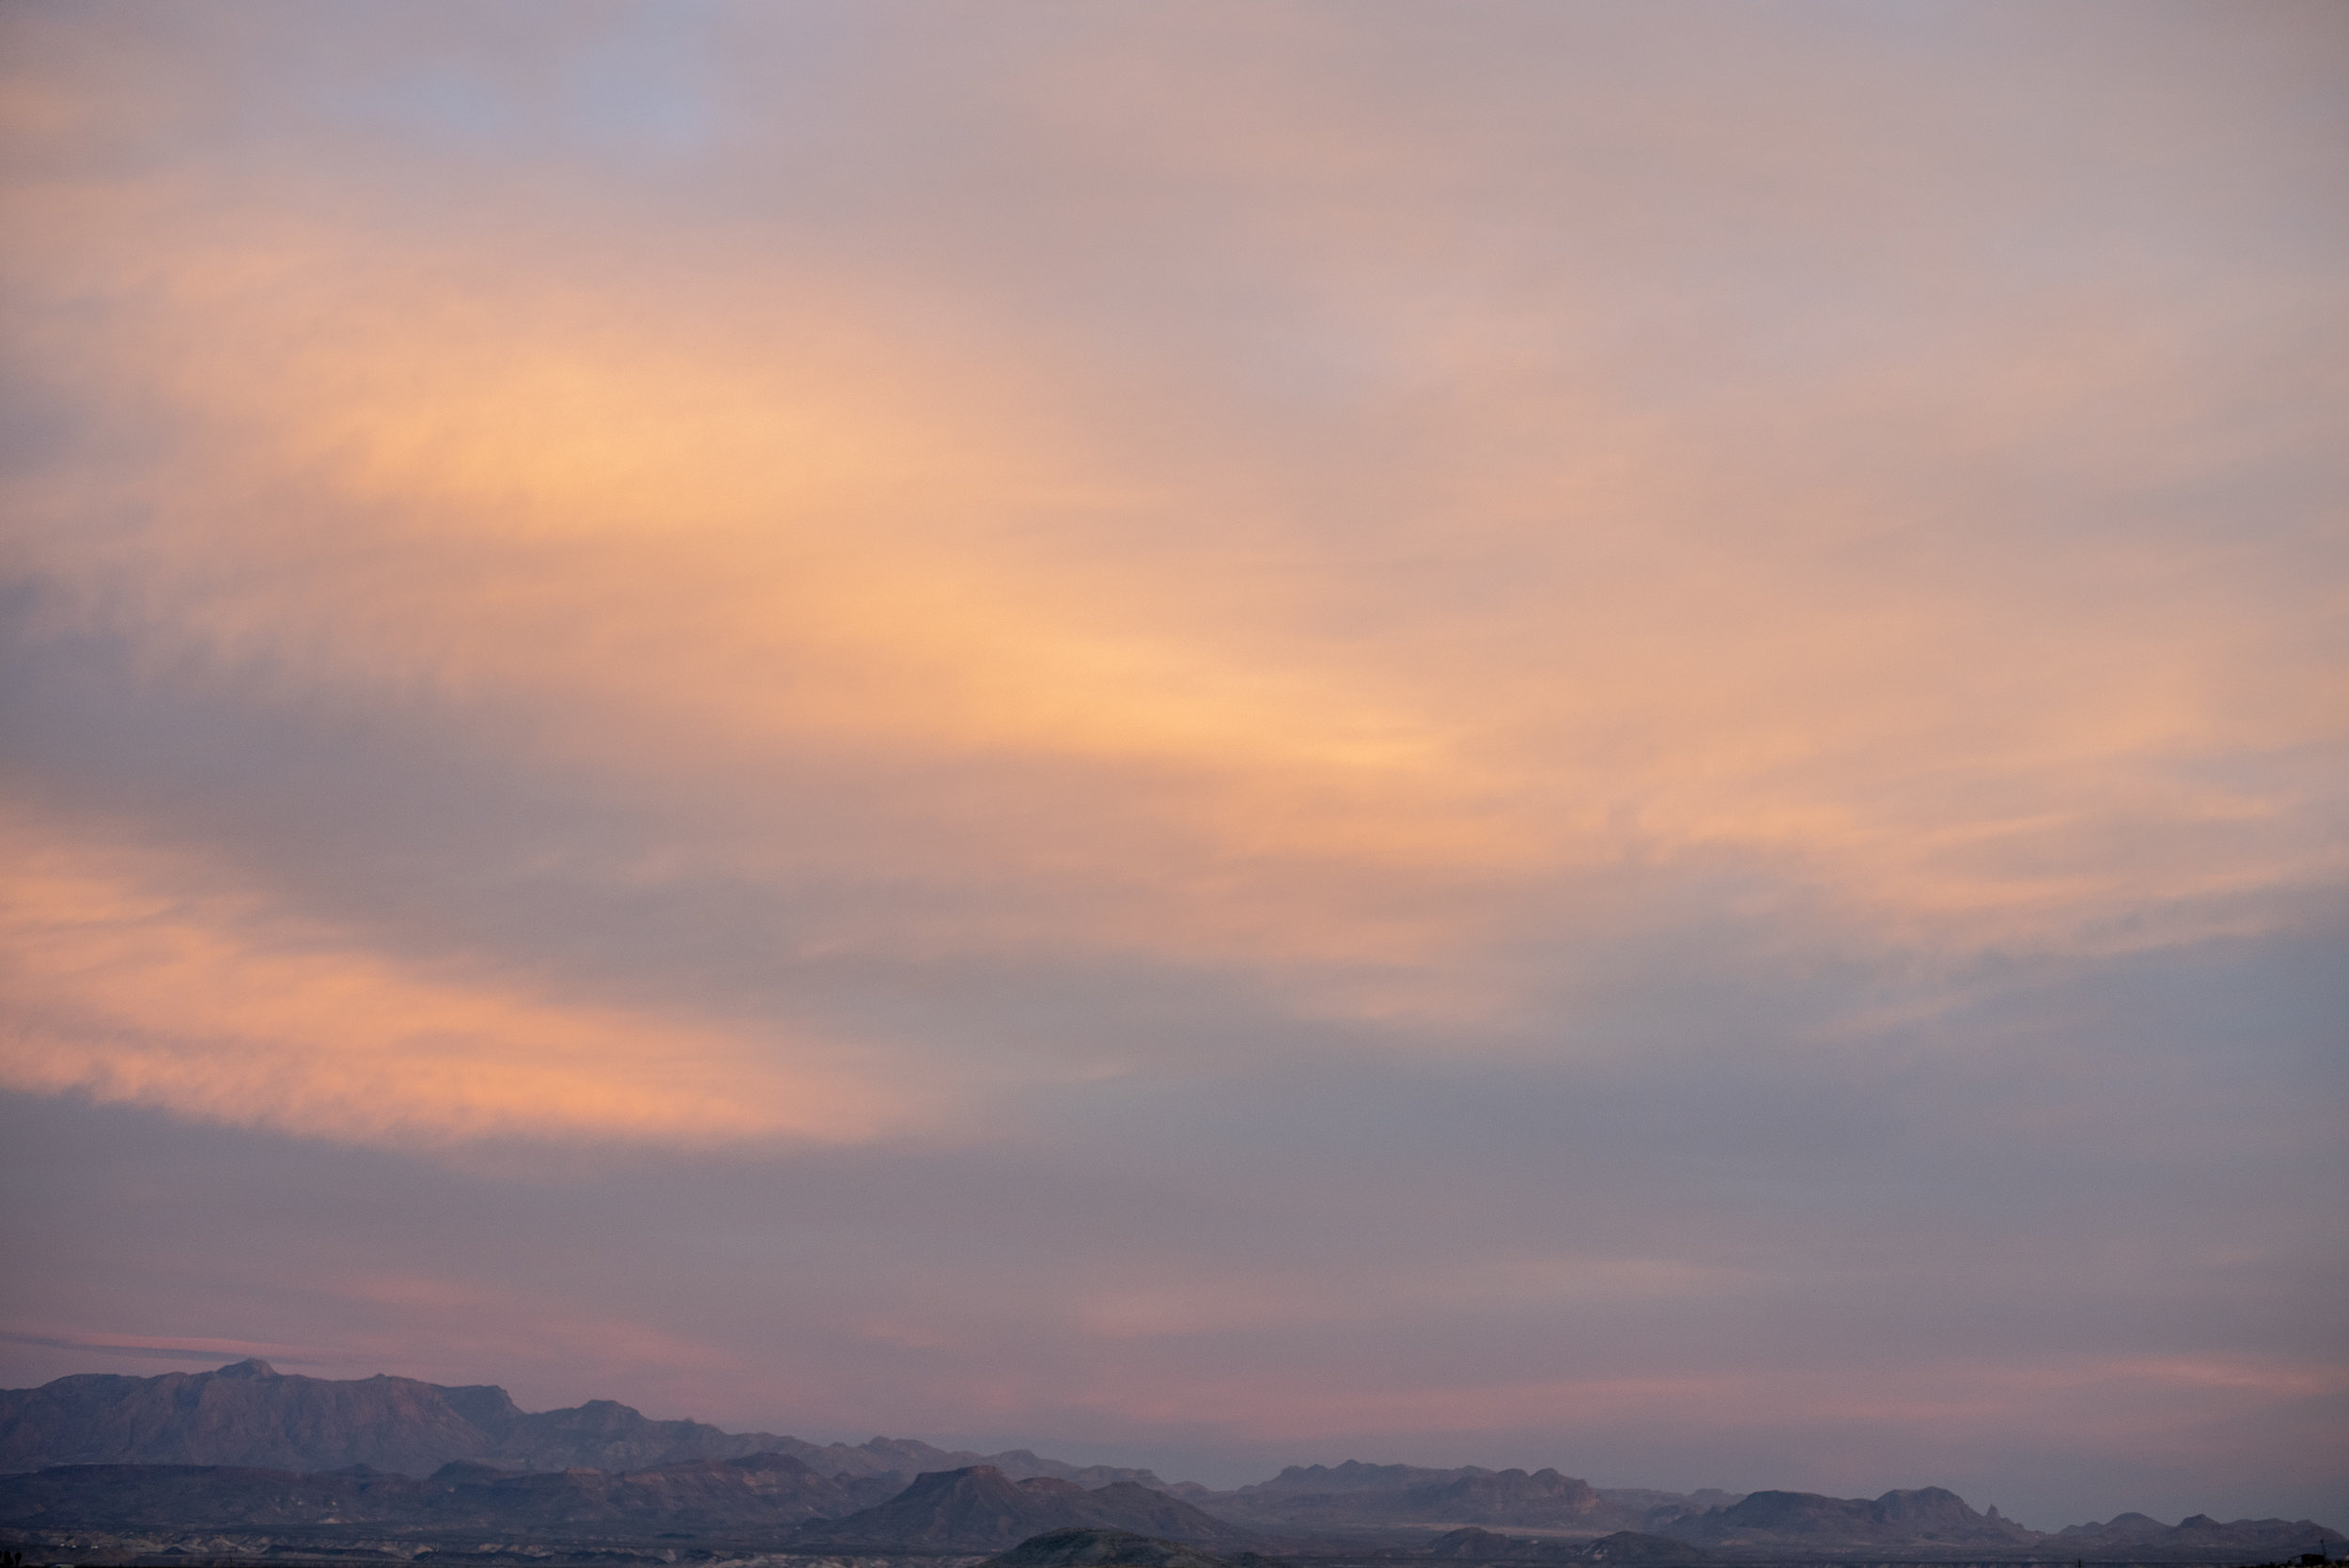 terlingua sky, dusk